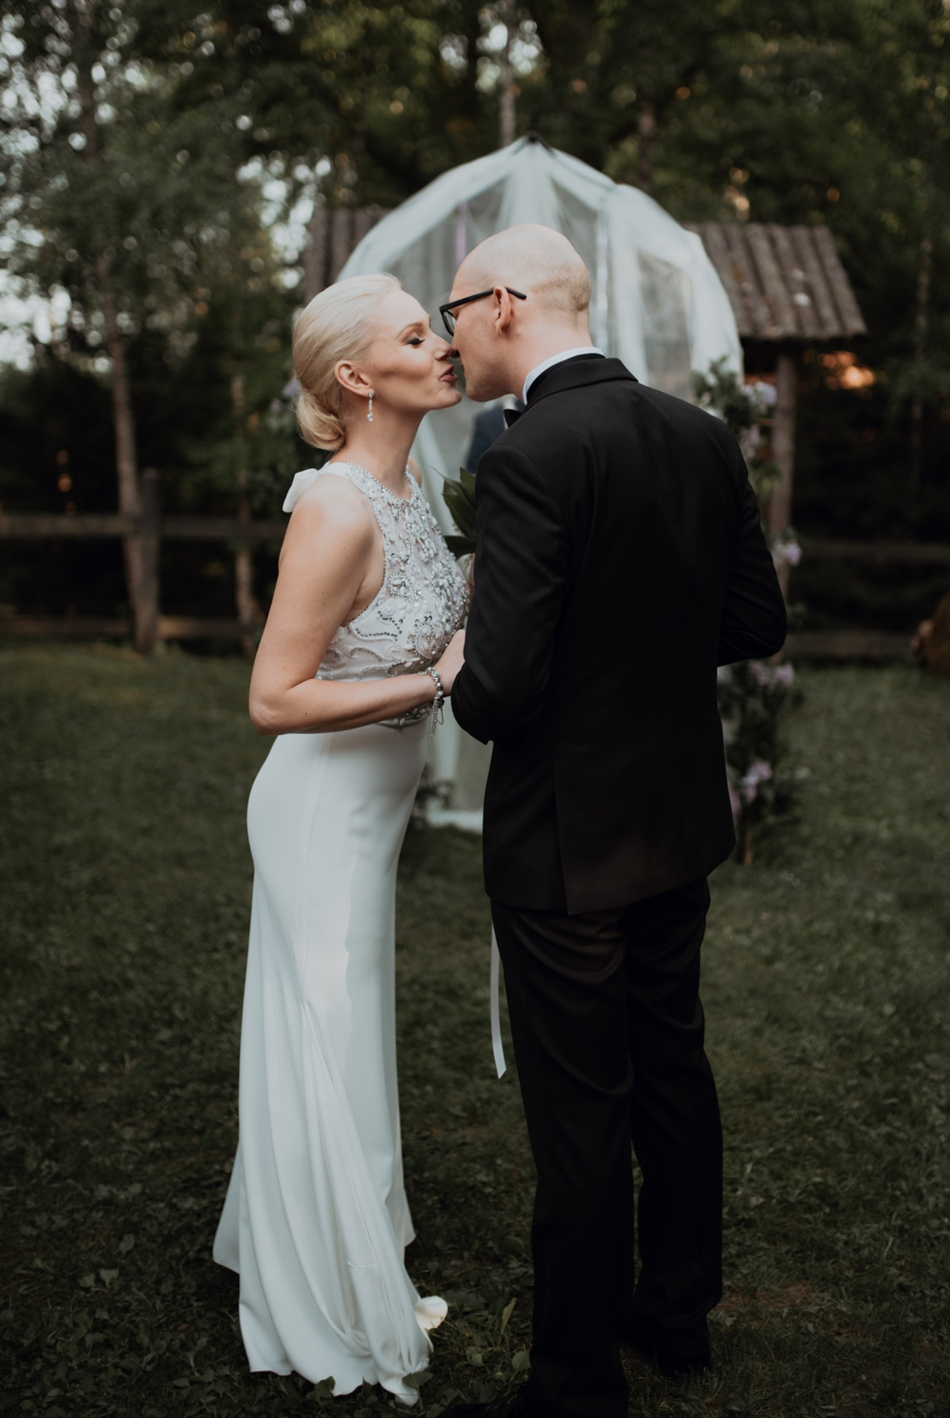 wedding-photographer-zukography-destination71.jpg